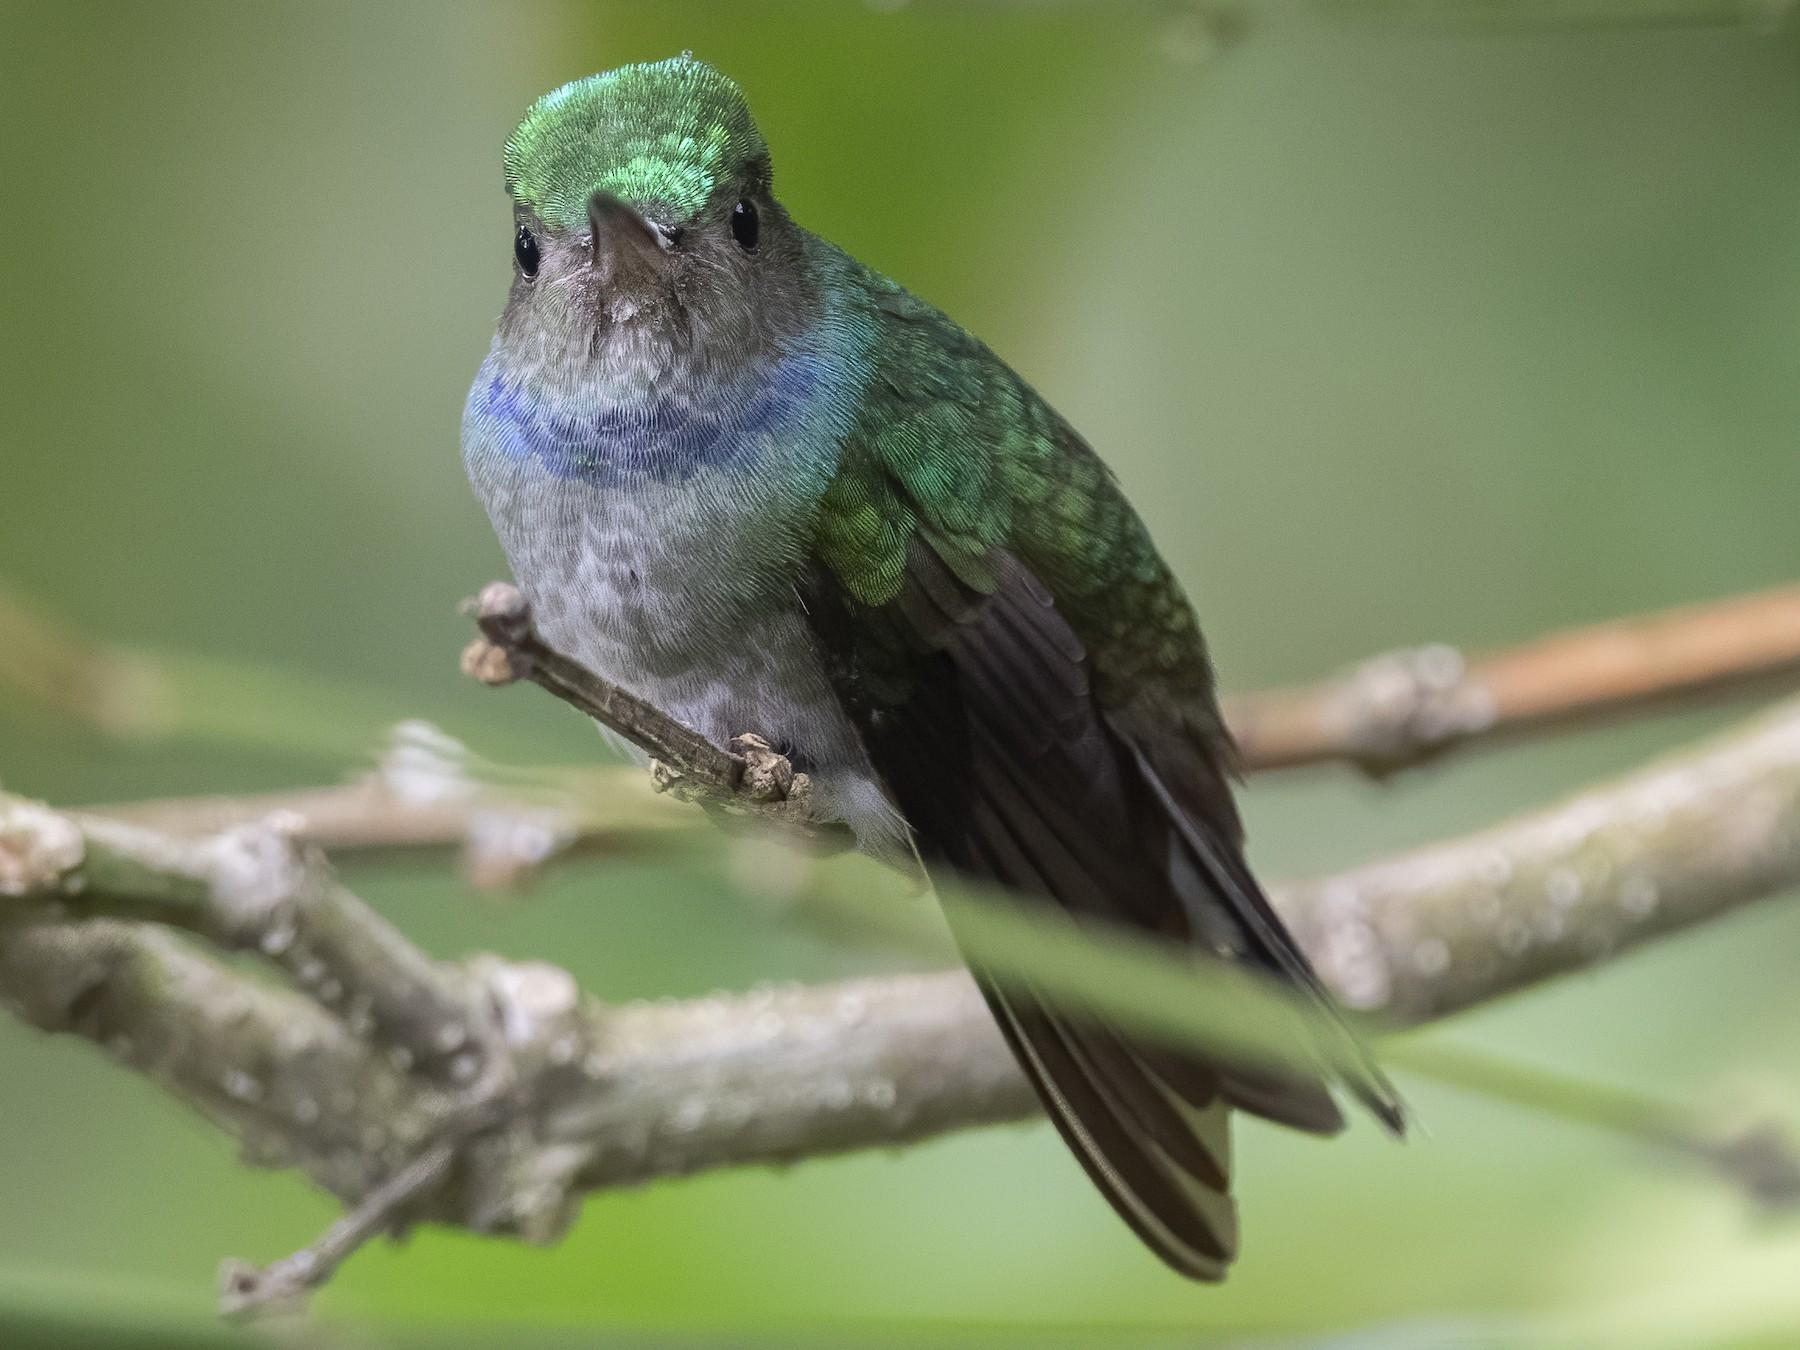 Charming Hummingbird - Peter Hawrylyshyn